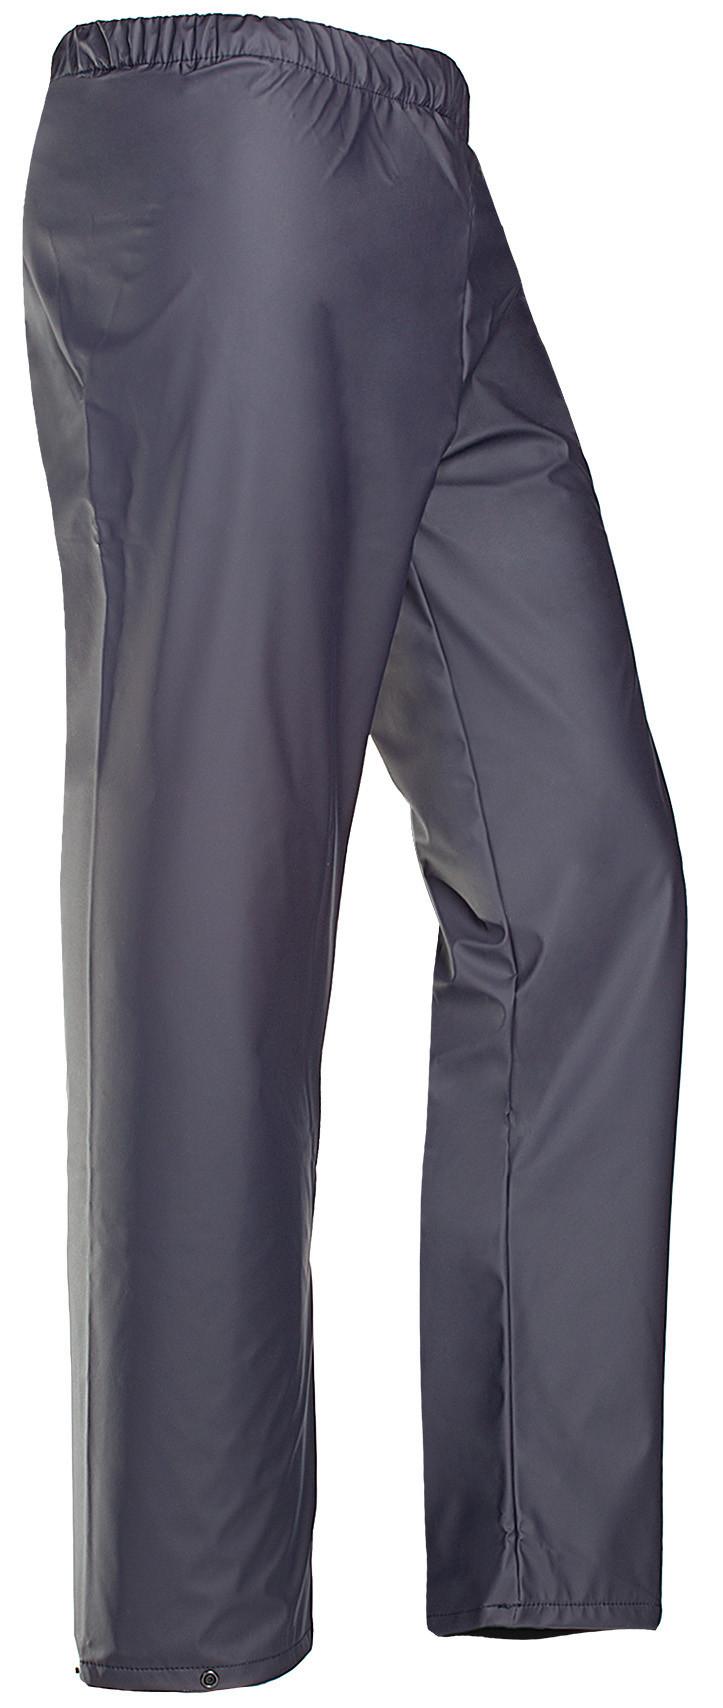 Trouser Navy Flexothane (XXL) 6360